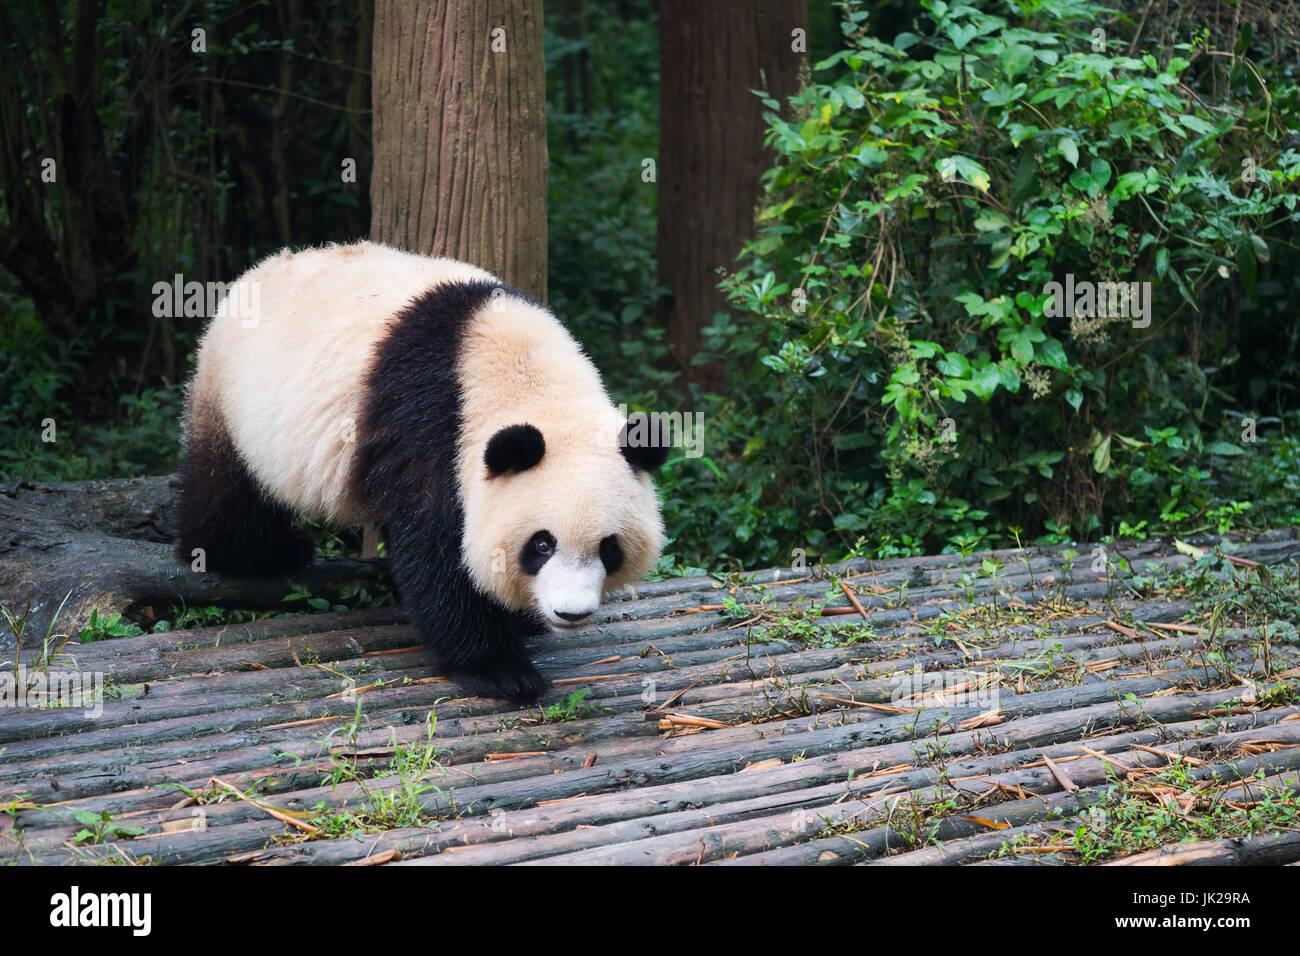 Giant panda cub walking on wood, Chengdu, Sichuan Province, China - Stock Image